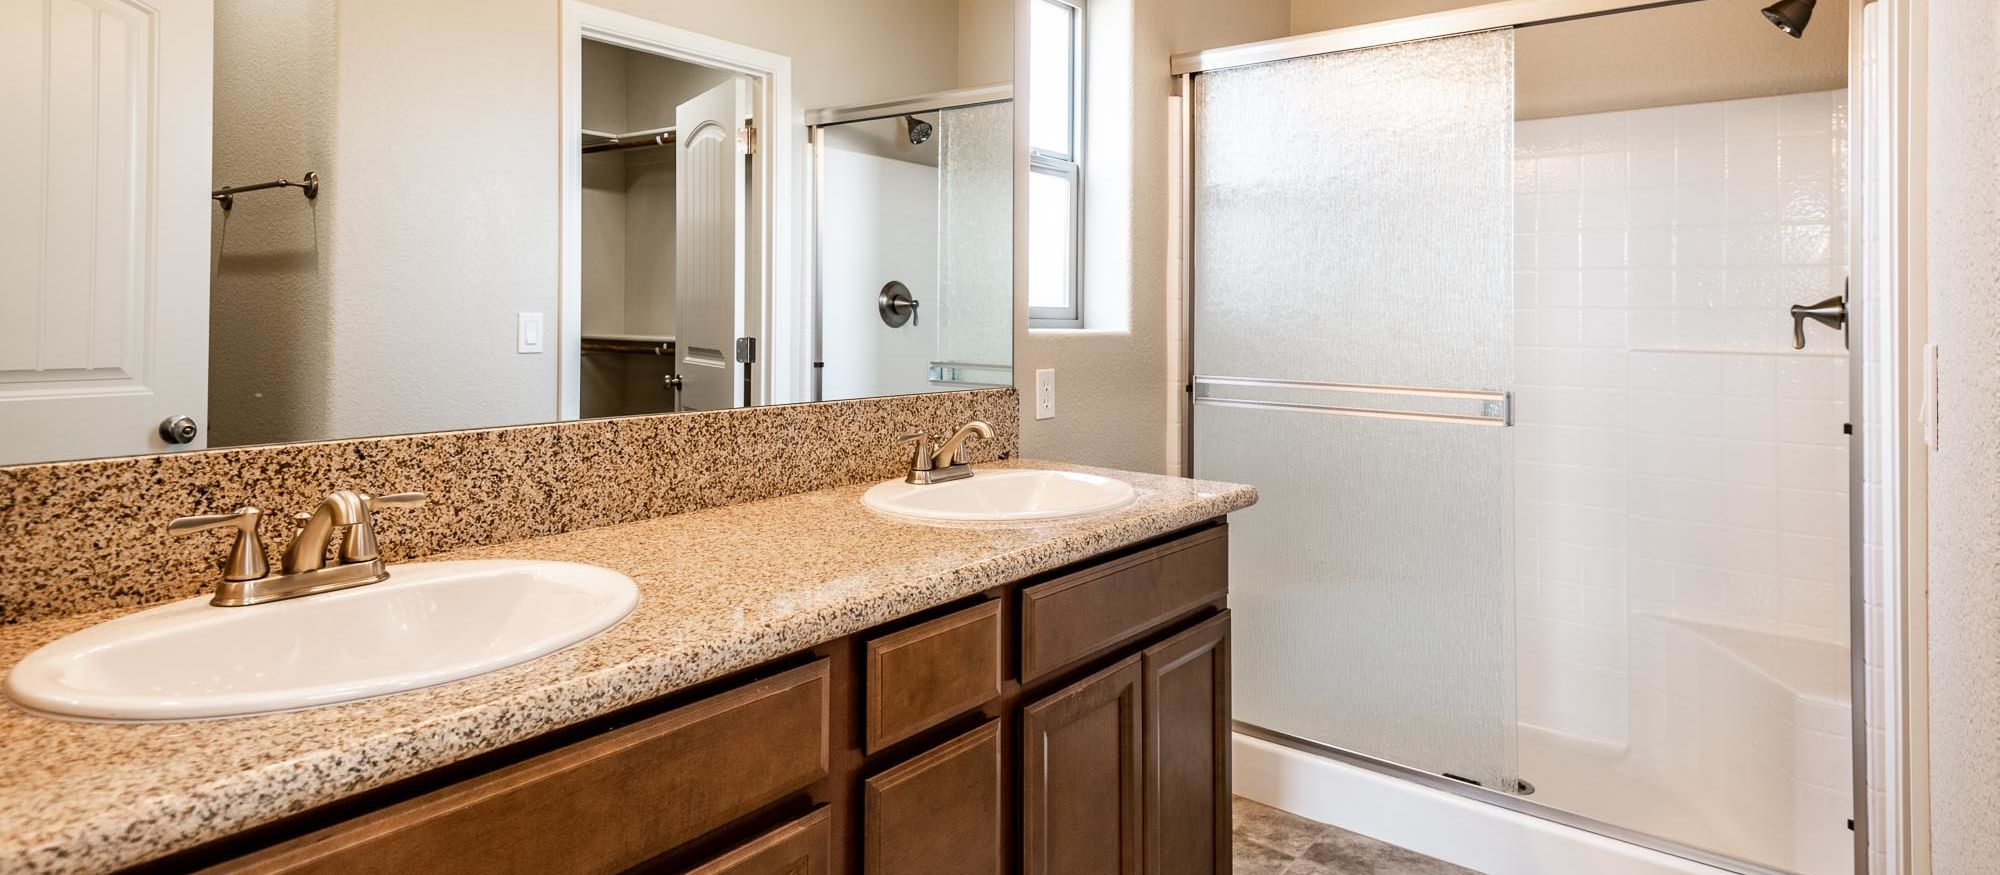 Bathroom featured in the Desert Rose 1706 By Angle Homes in Kingman-Lake Havasu City, AZ